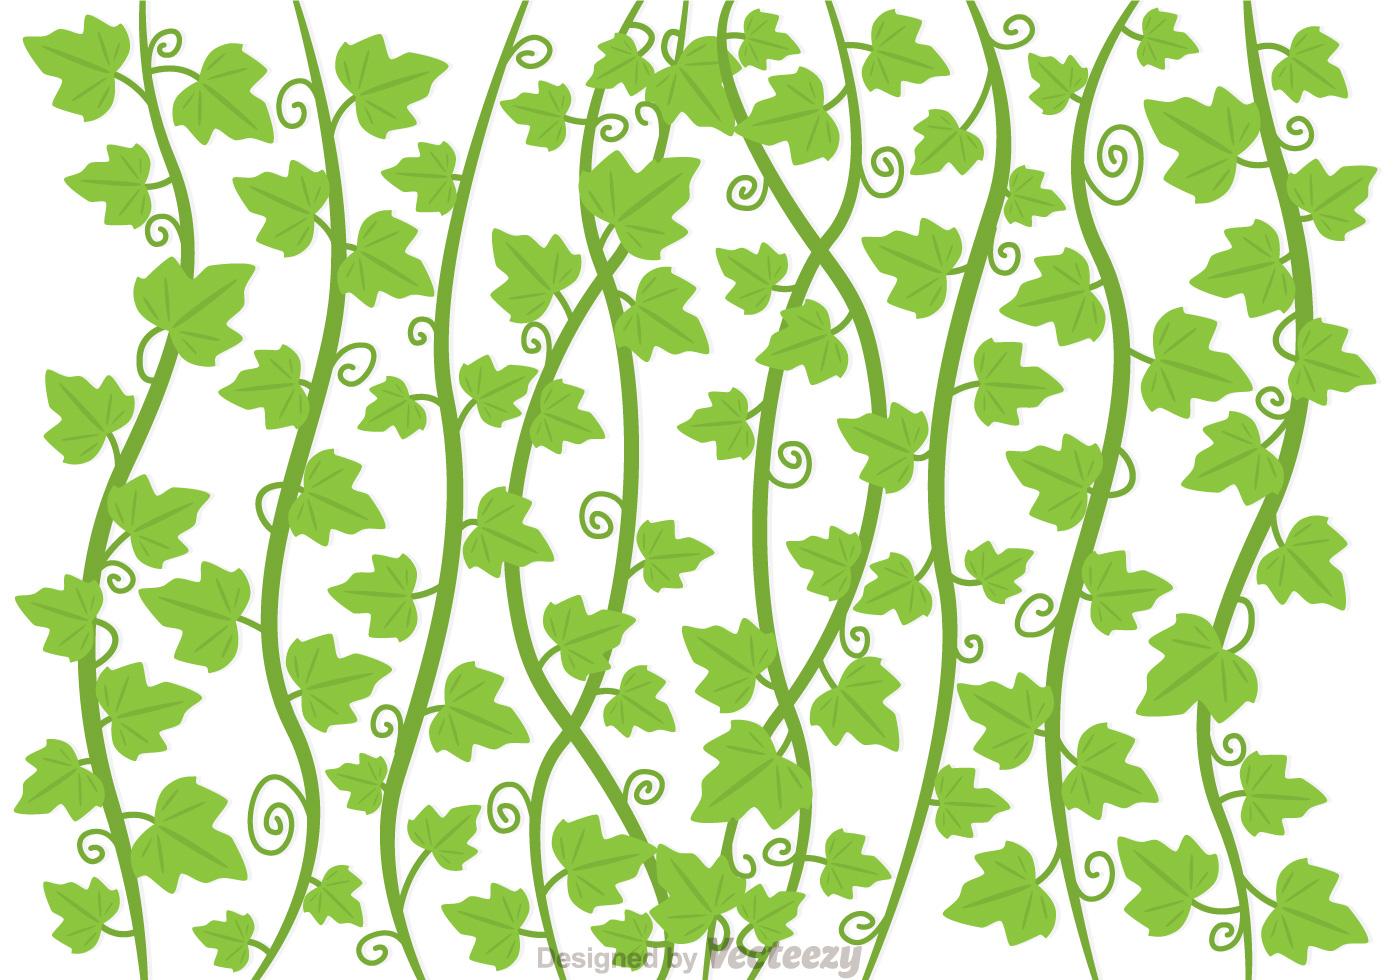 Ivy Vine Vector - Download Free Vectors, Clipart Graphics ...